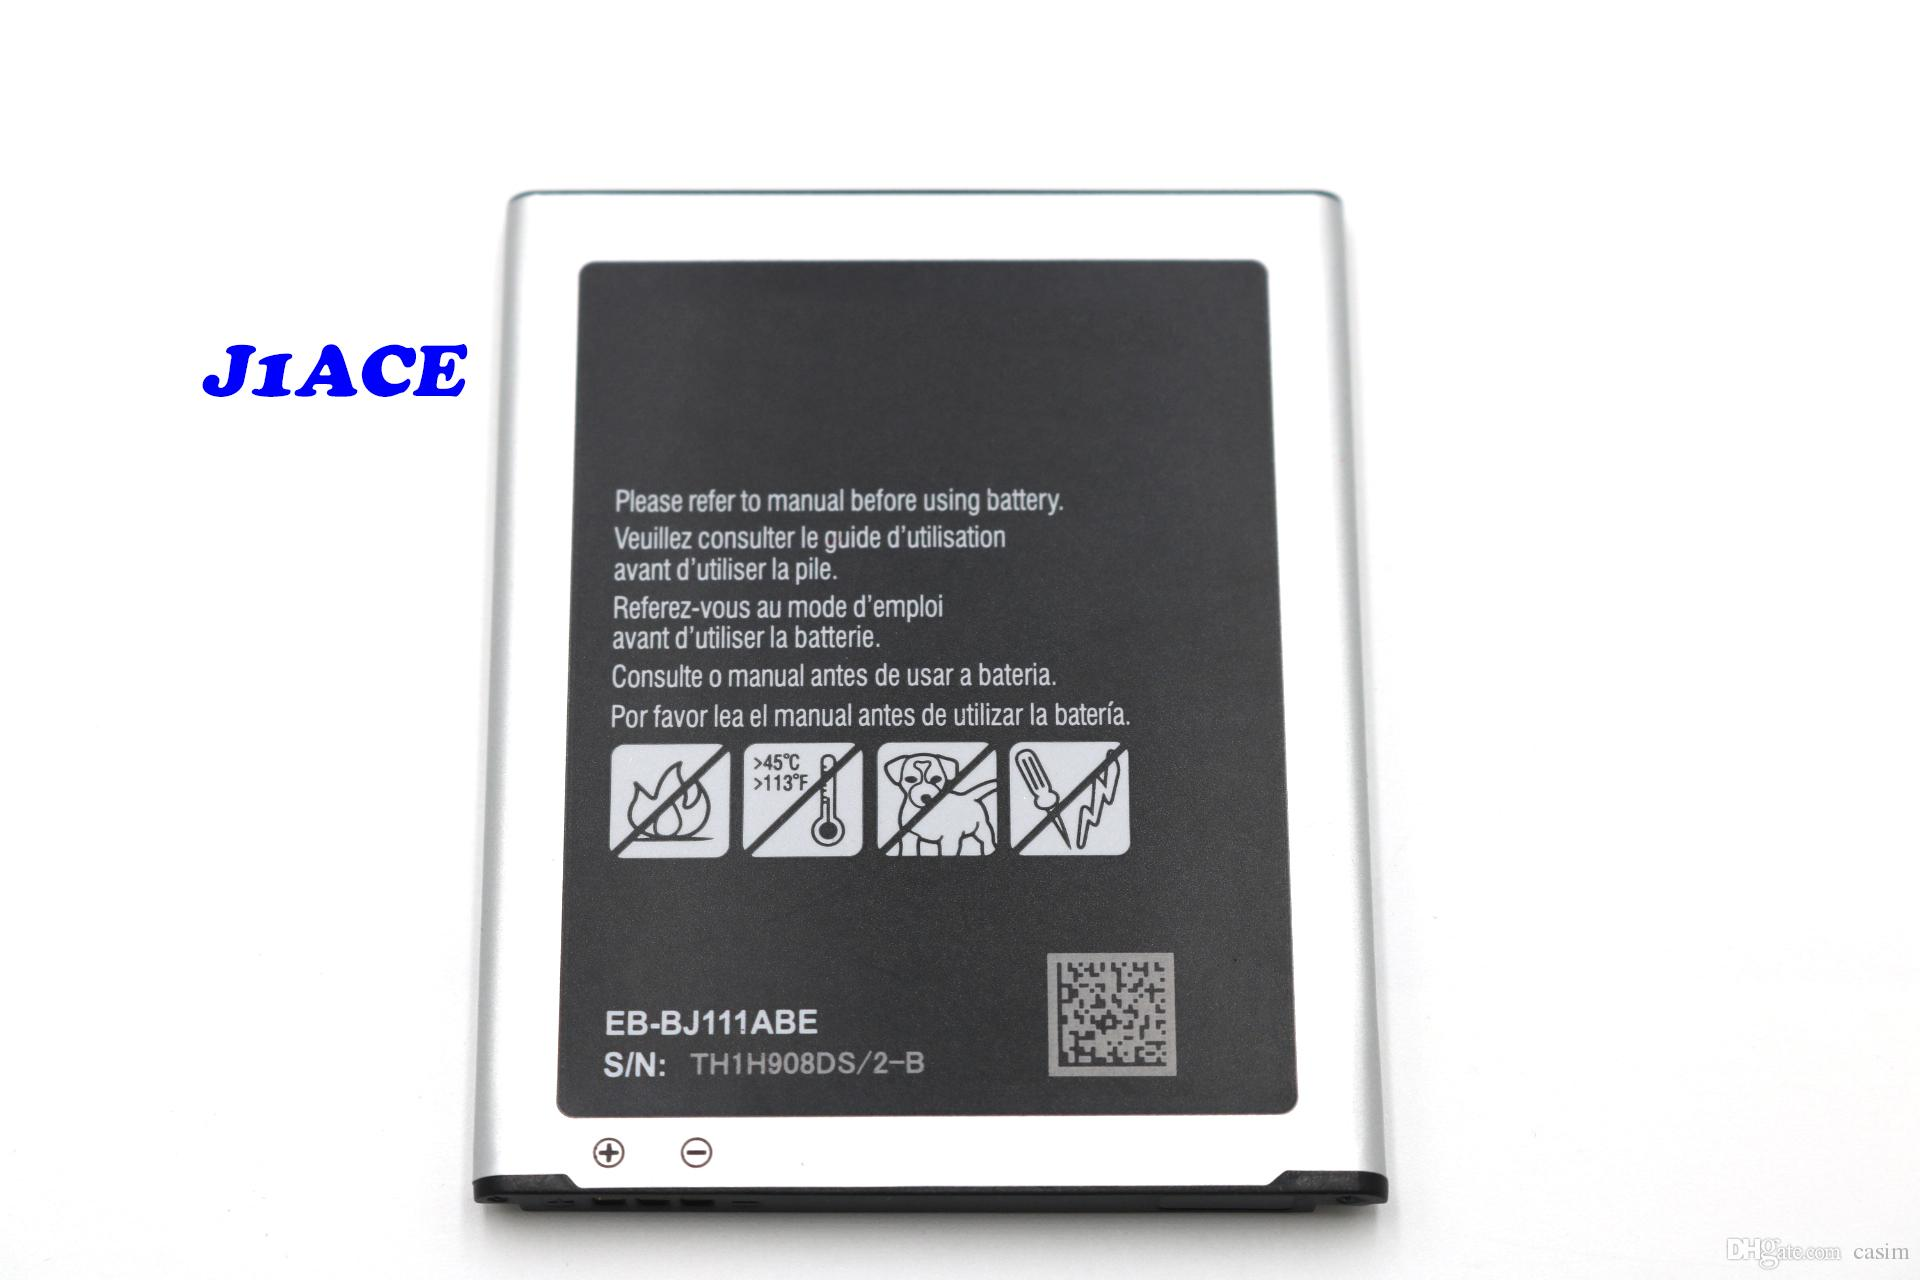 Yüksek kaliteli cep telefonu batarya tedarikçisi J111 pil, samsung Galaxy J1ACE / J110 / J120 pil Akku